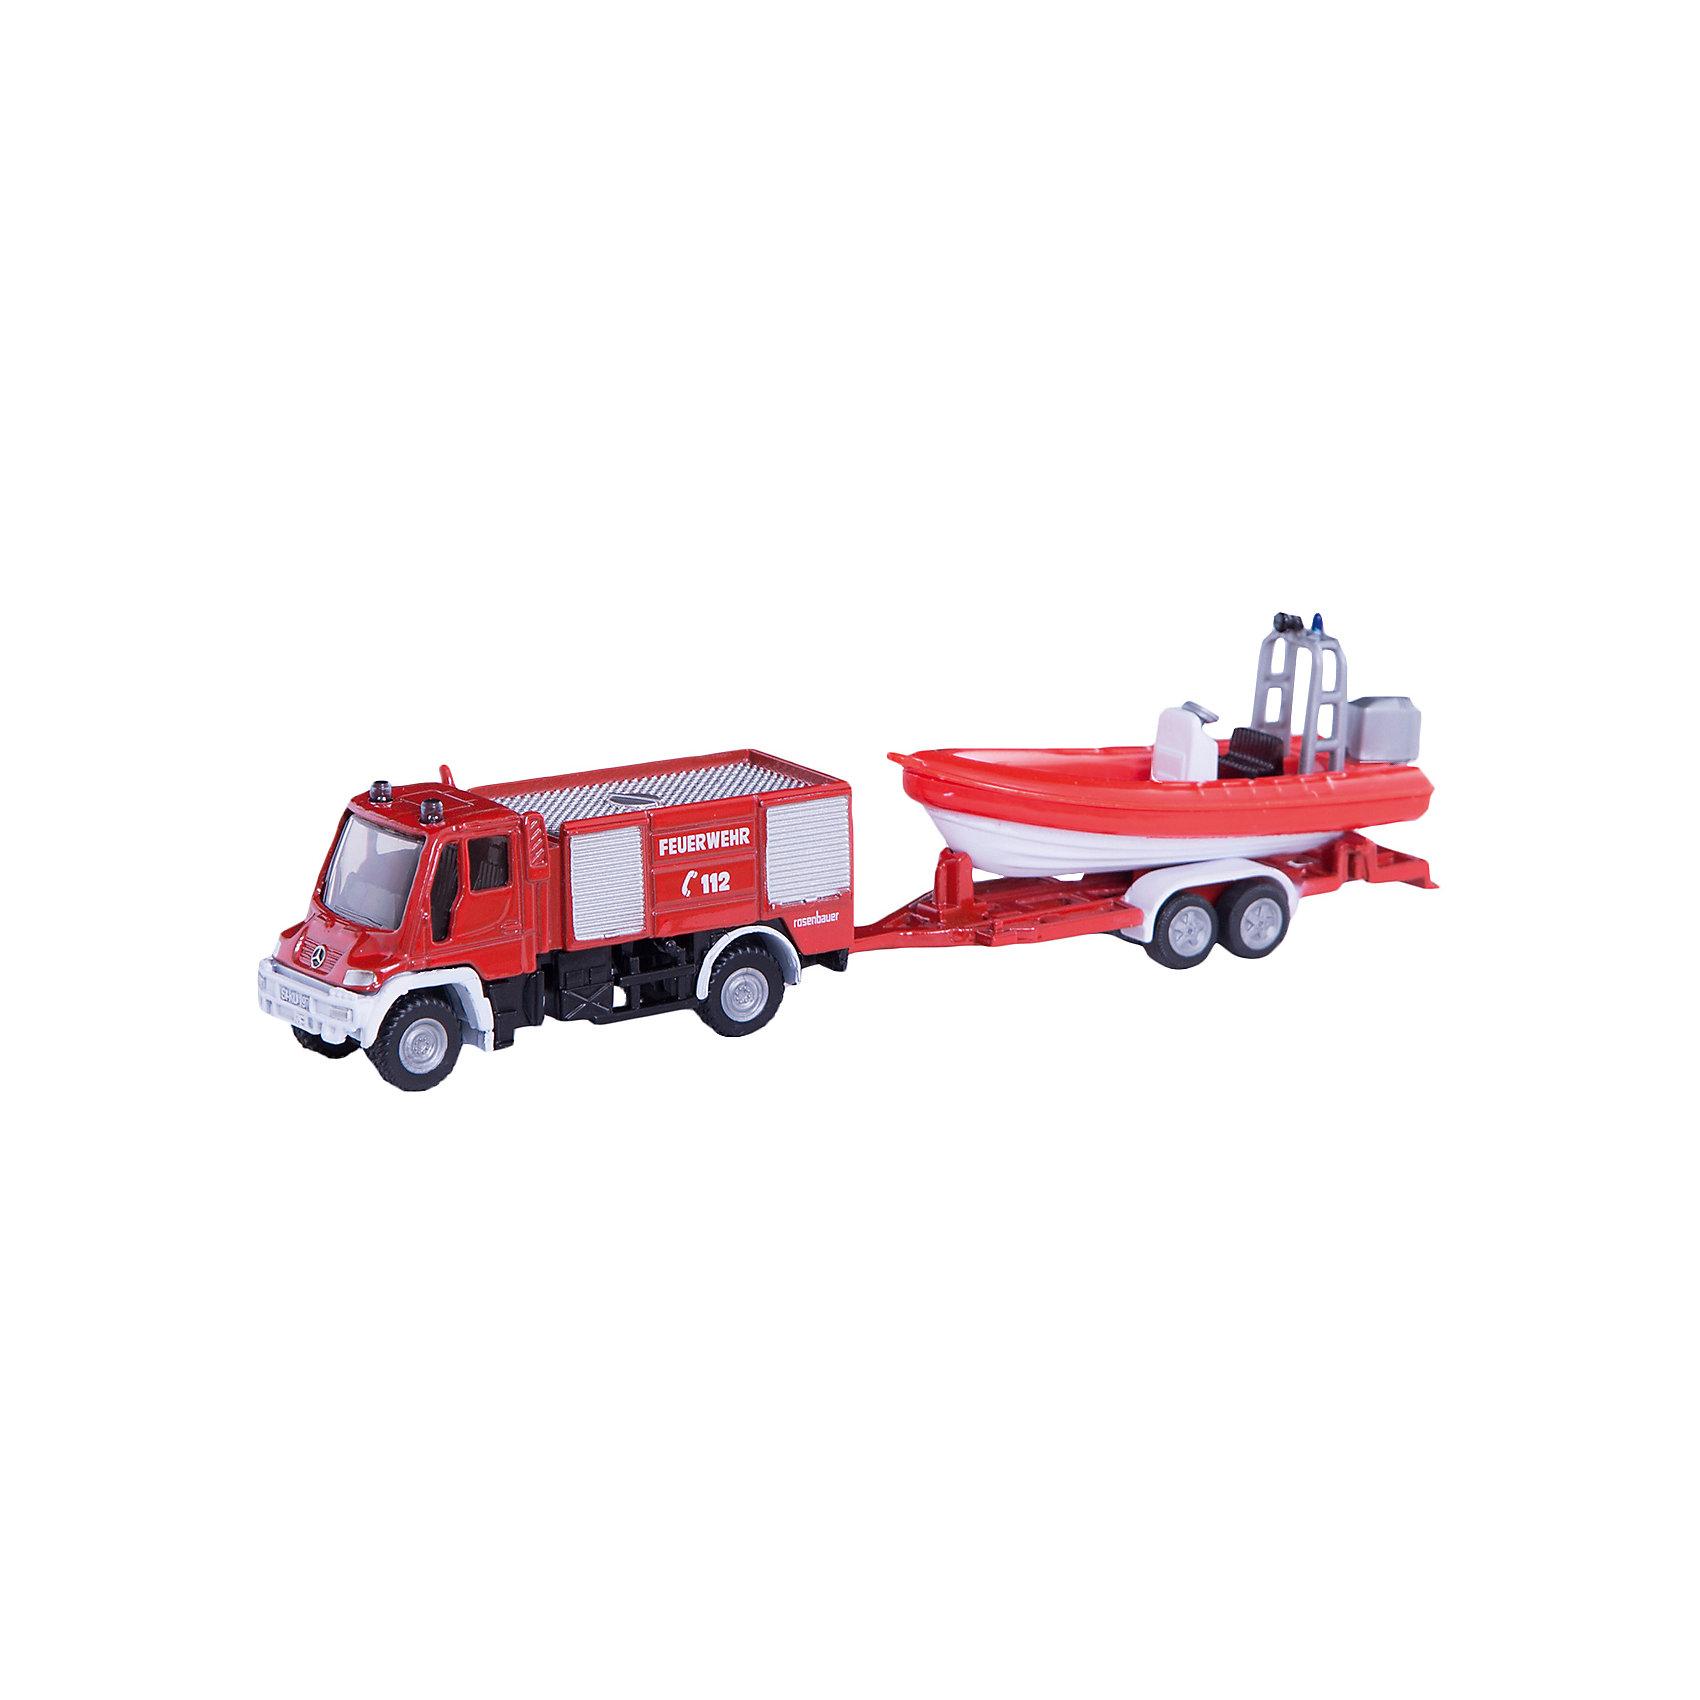 SIKU SIKU 1636 Пожарная машина Unimog с катером 1:87 siku квадроцикл с катером siku